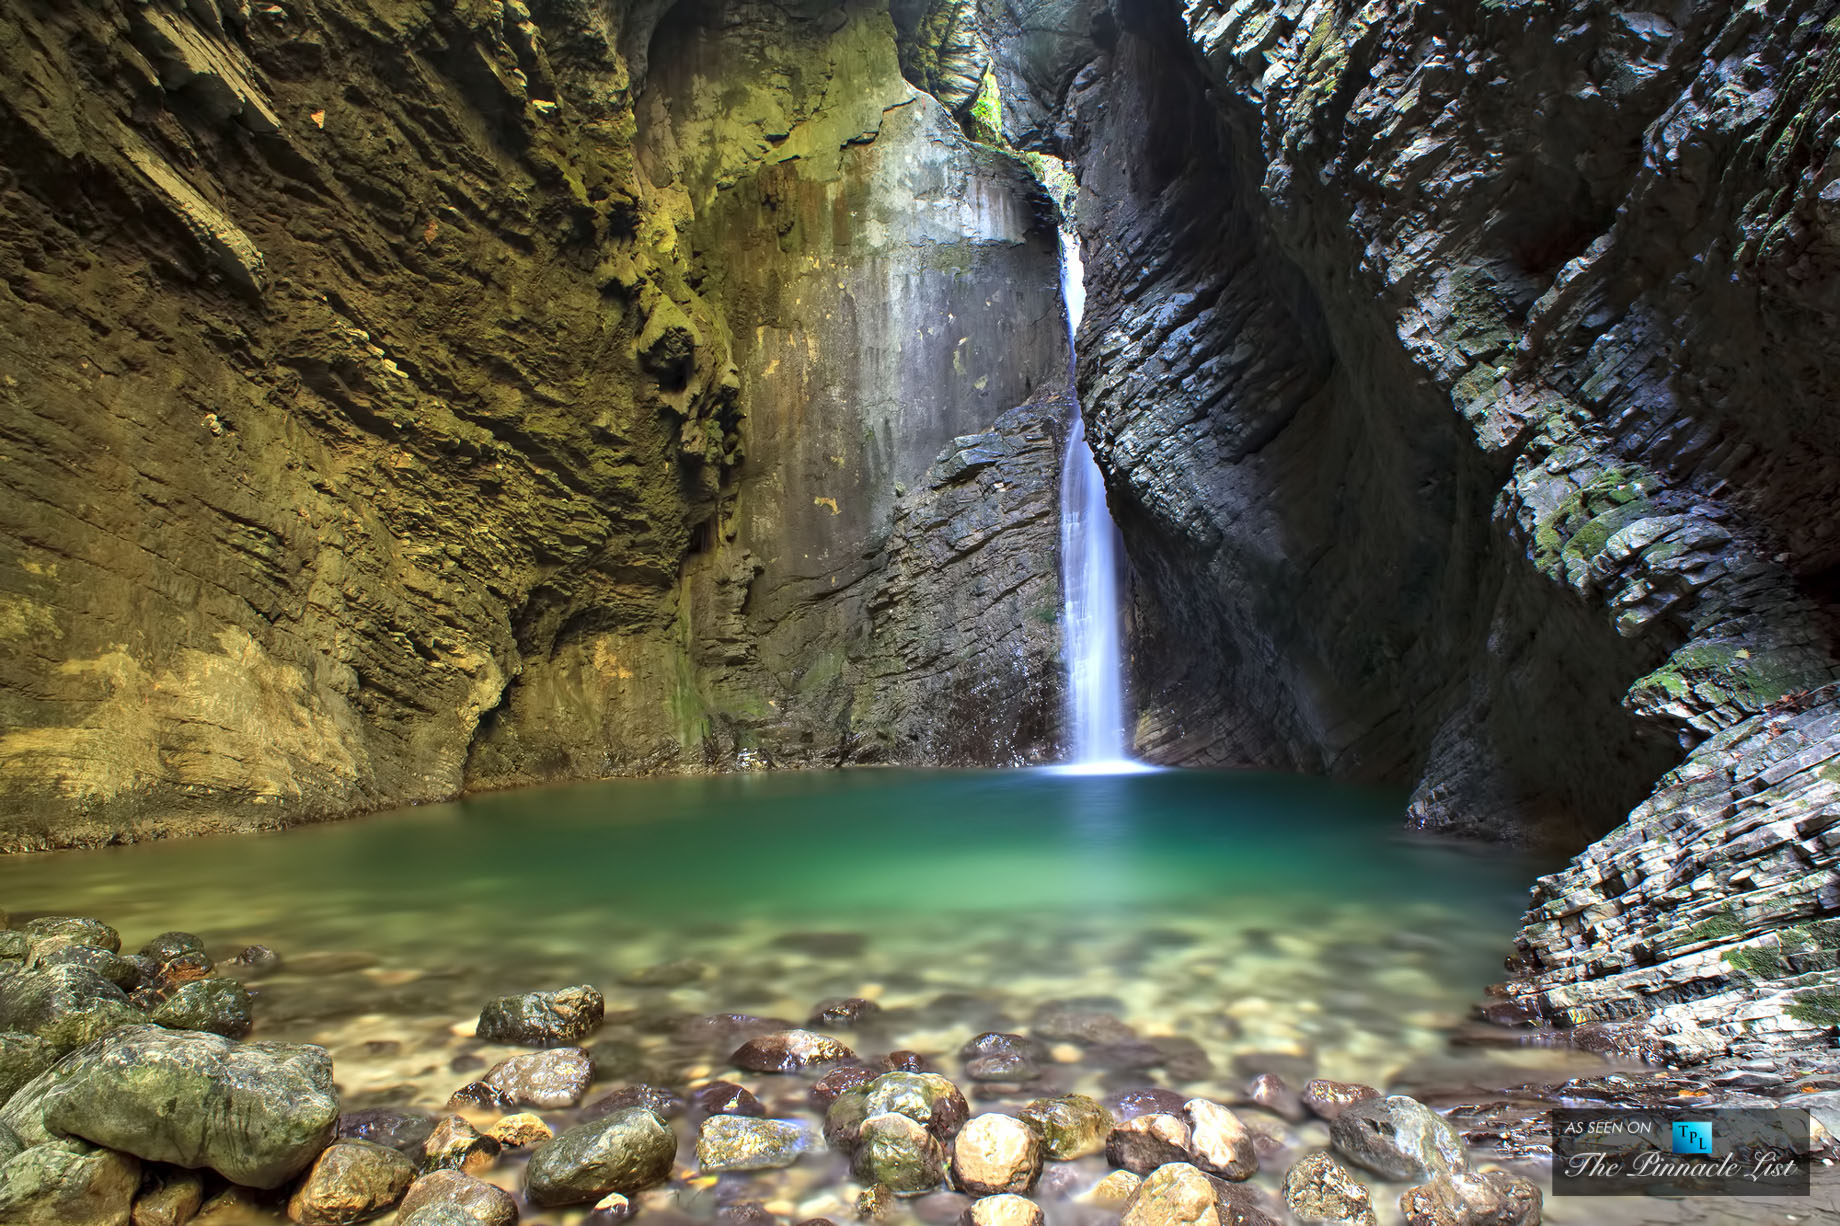 Slovenia Kobarid - Top 5 Secret Luxury Locations in Eastern Europe